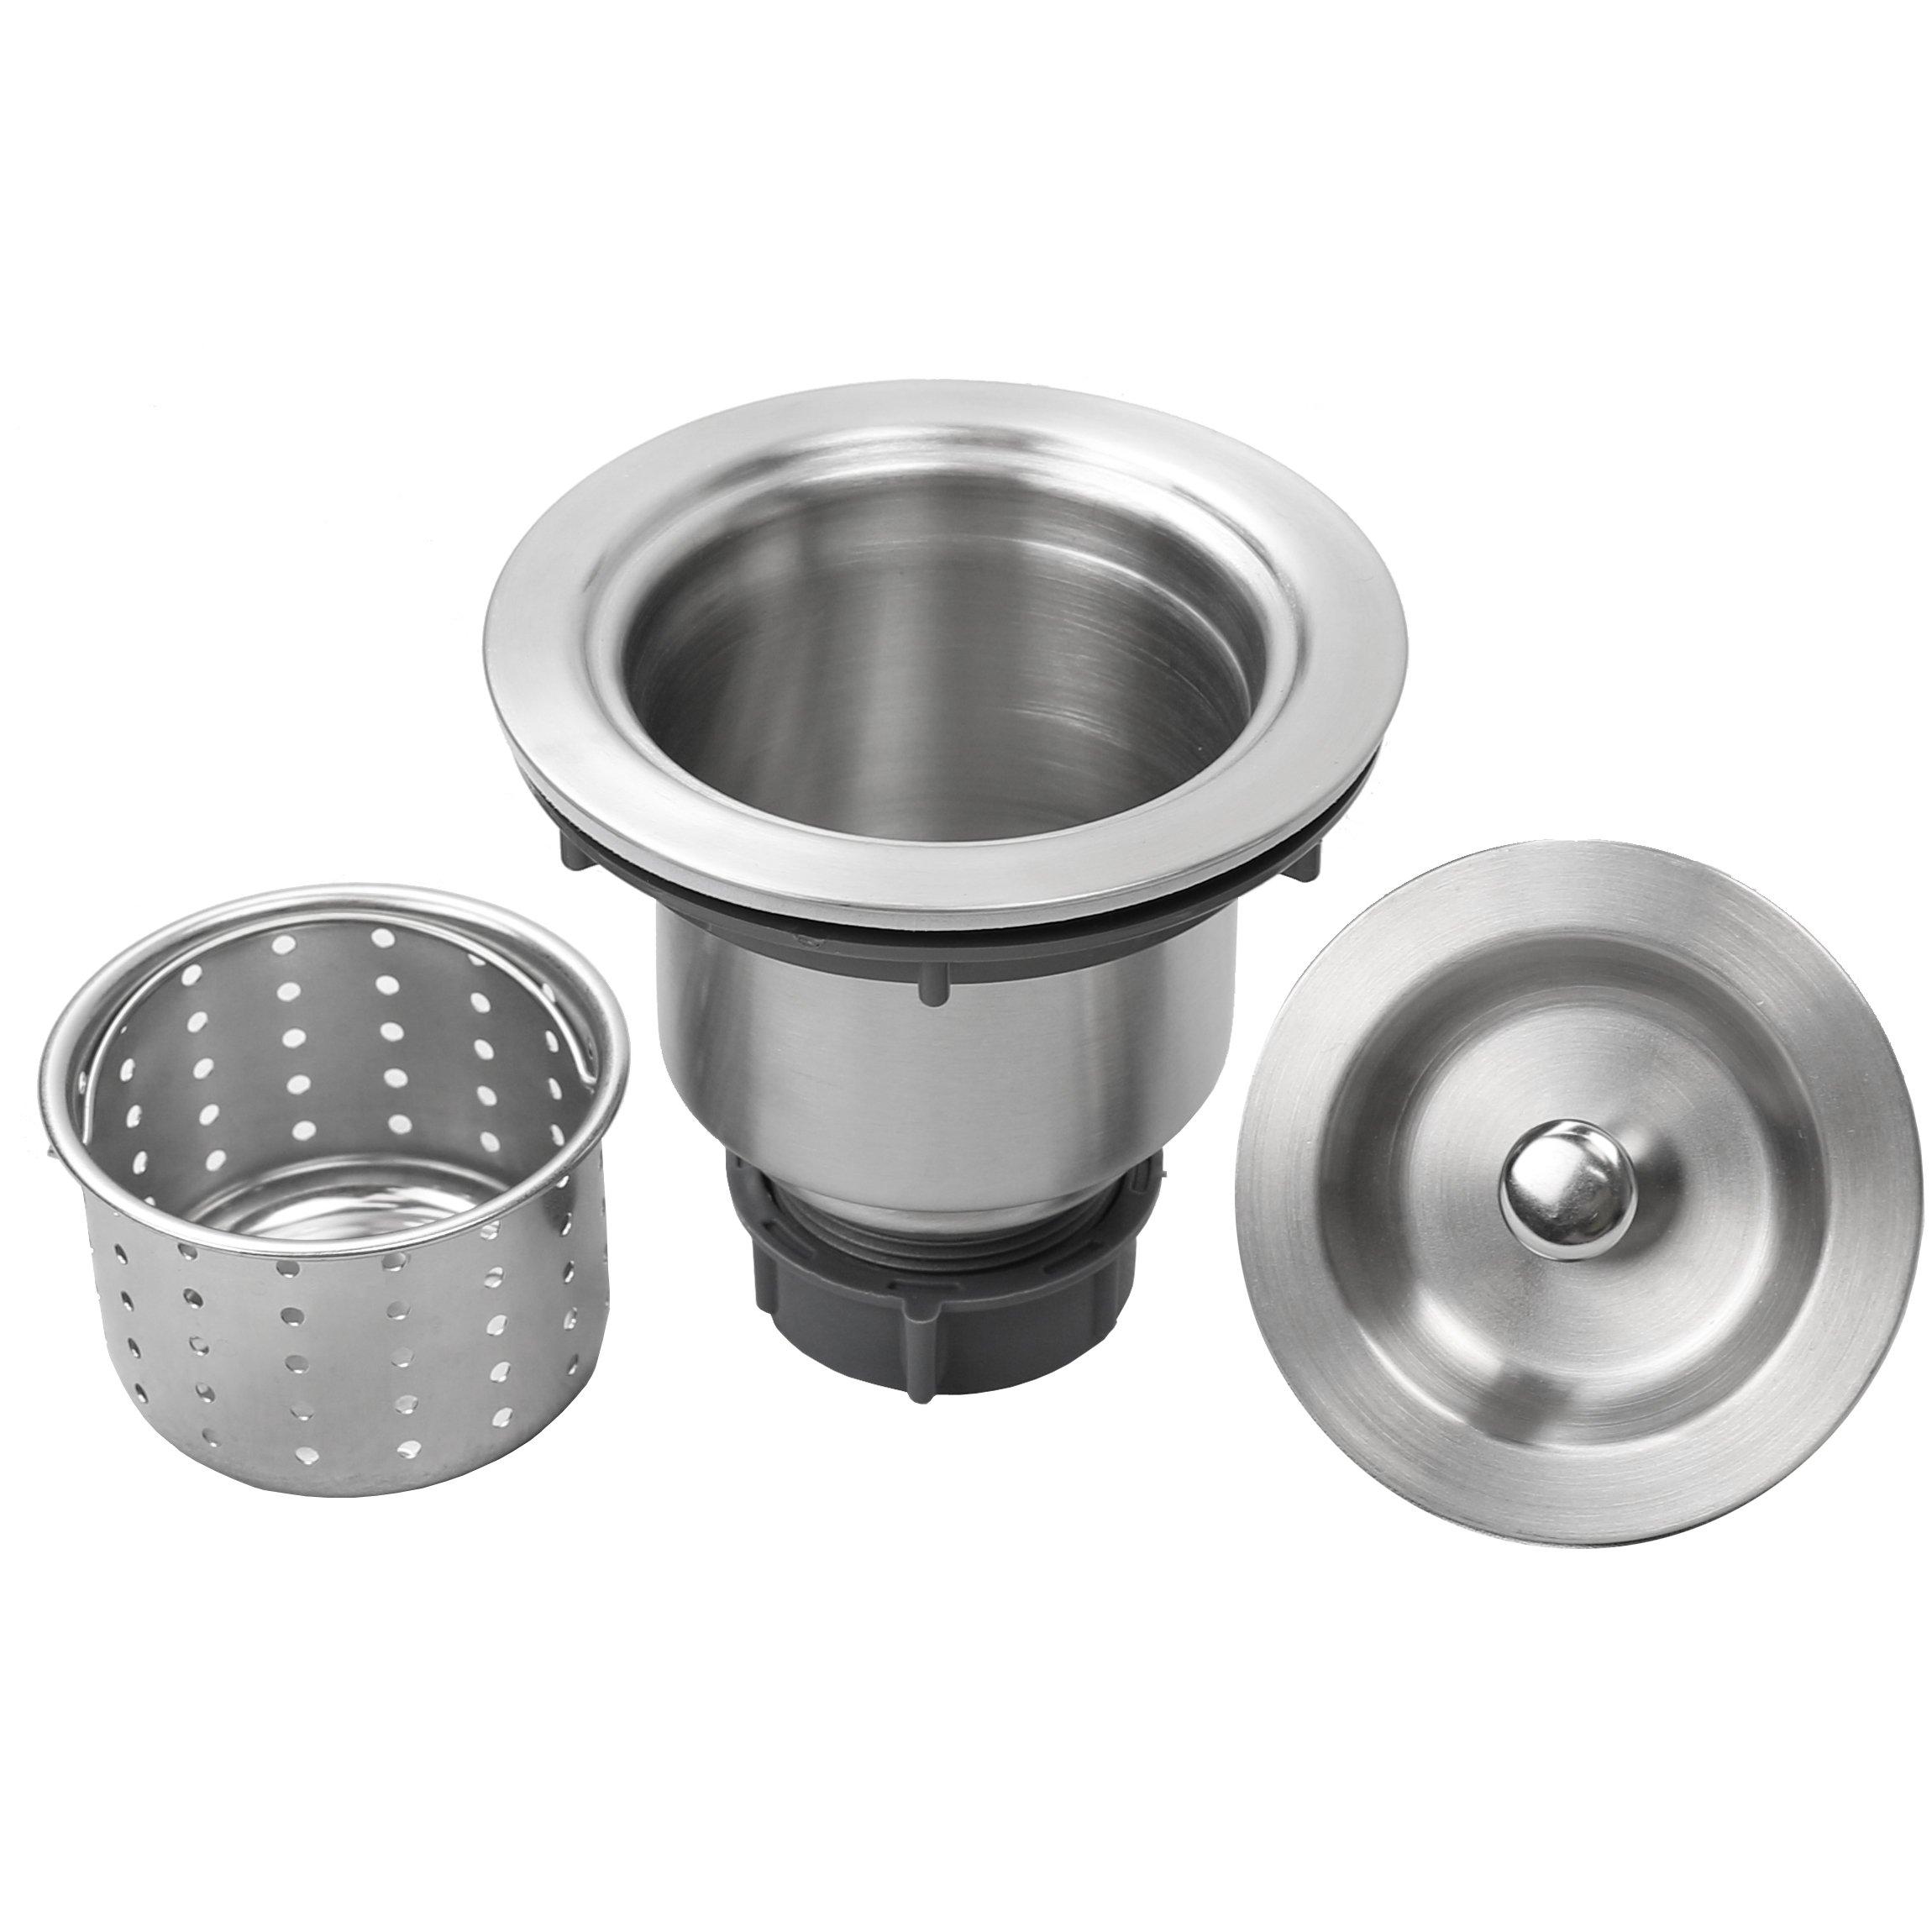 10 Bar Sink Ticor Plz 03 Undermount 18 Gauge Stainless Steel Square Kitchen Sink With Tight Radius Corners